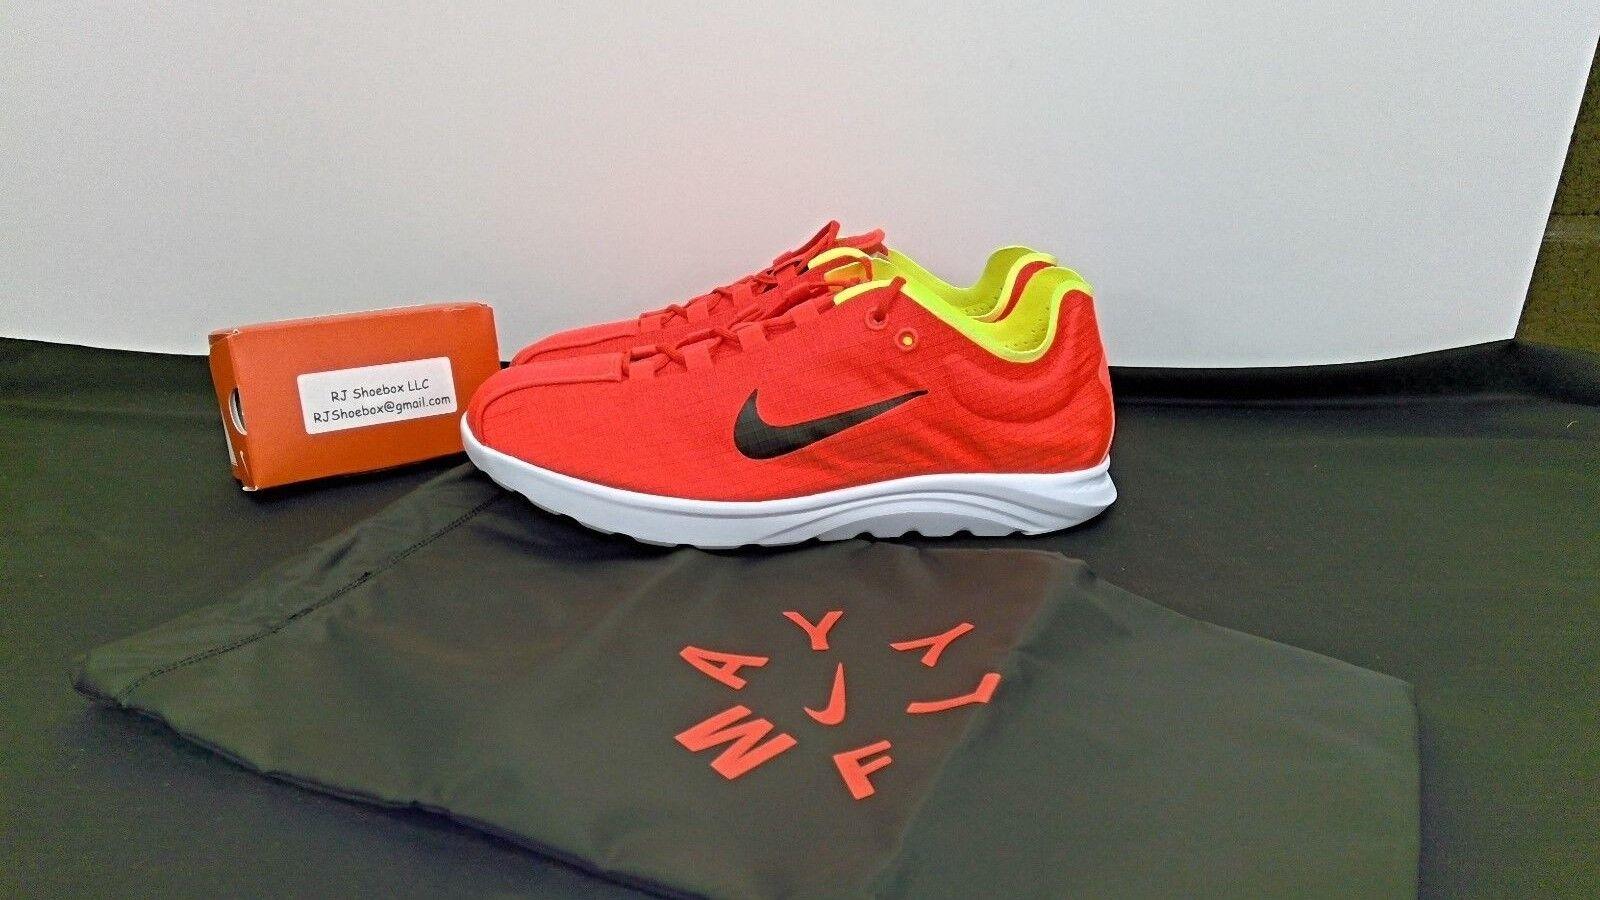 Nike Mayfly Lite SE 876188 600 BNIB with Dust Bag